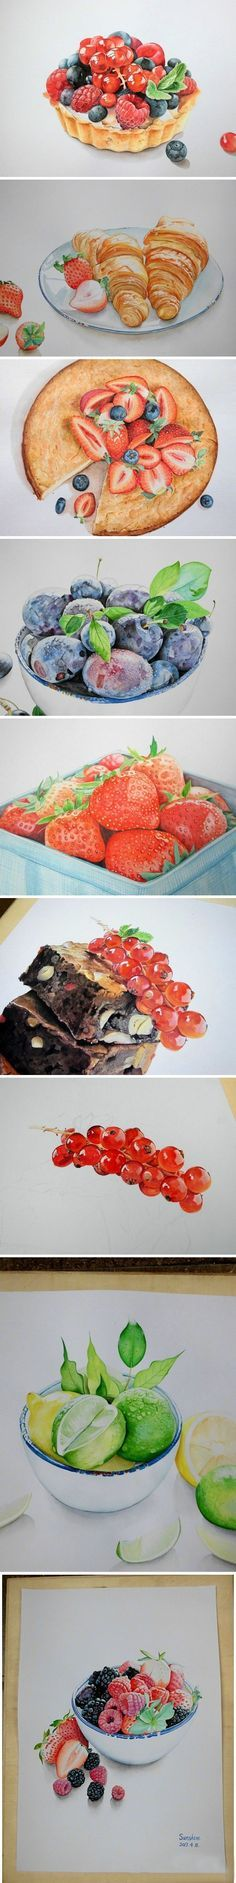 Good realistic set of dishes illustrator ... (Author: Sly)